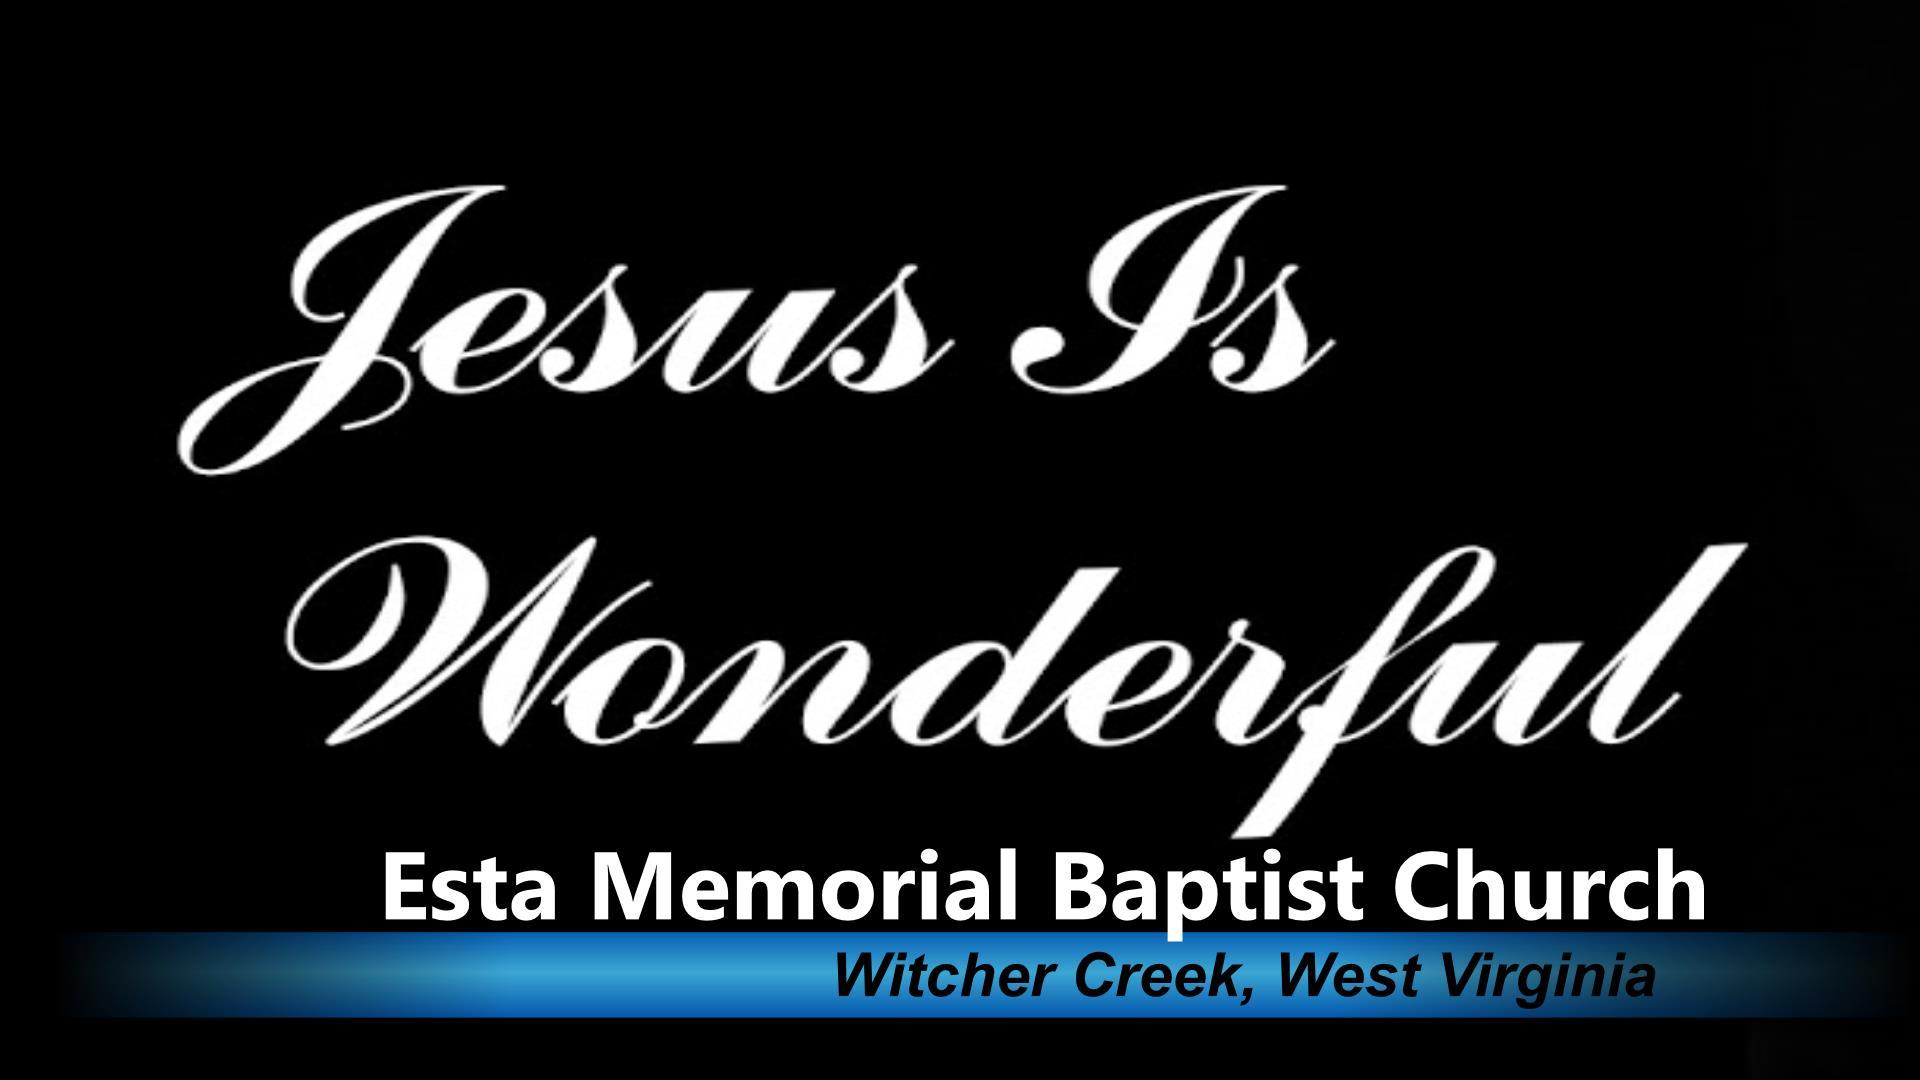 JESUS IS WONDERFUL